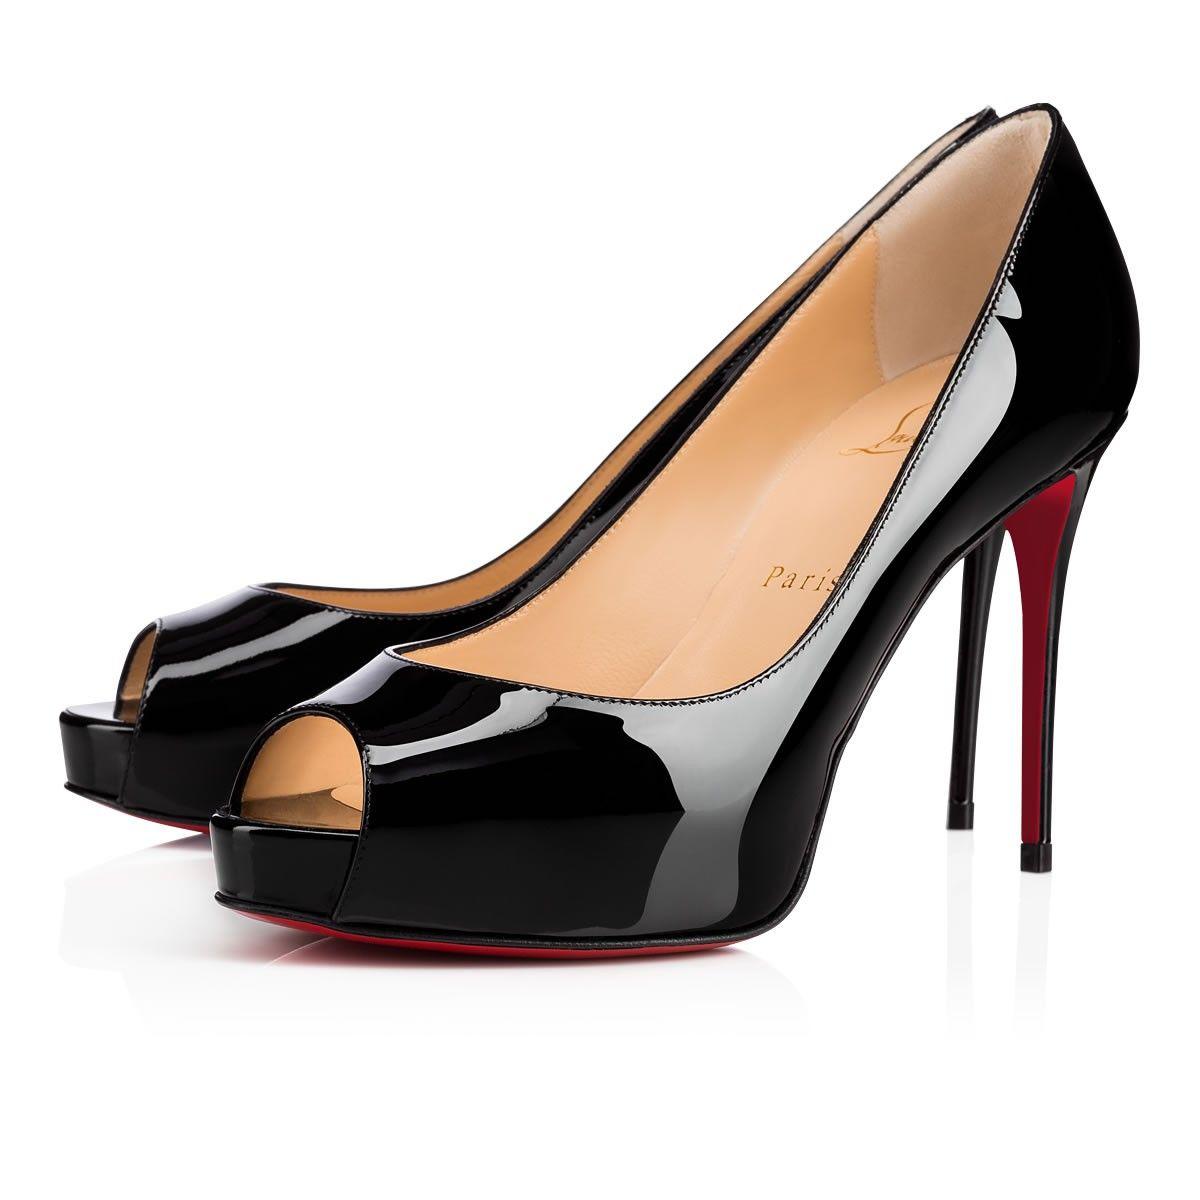 e2255e7964b Christian Louboutin New Very Prive | Lets play dress up | Shoes ...